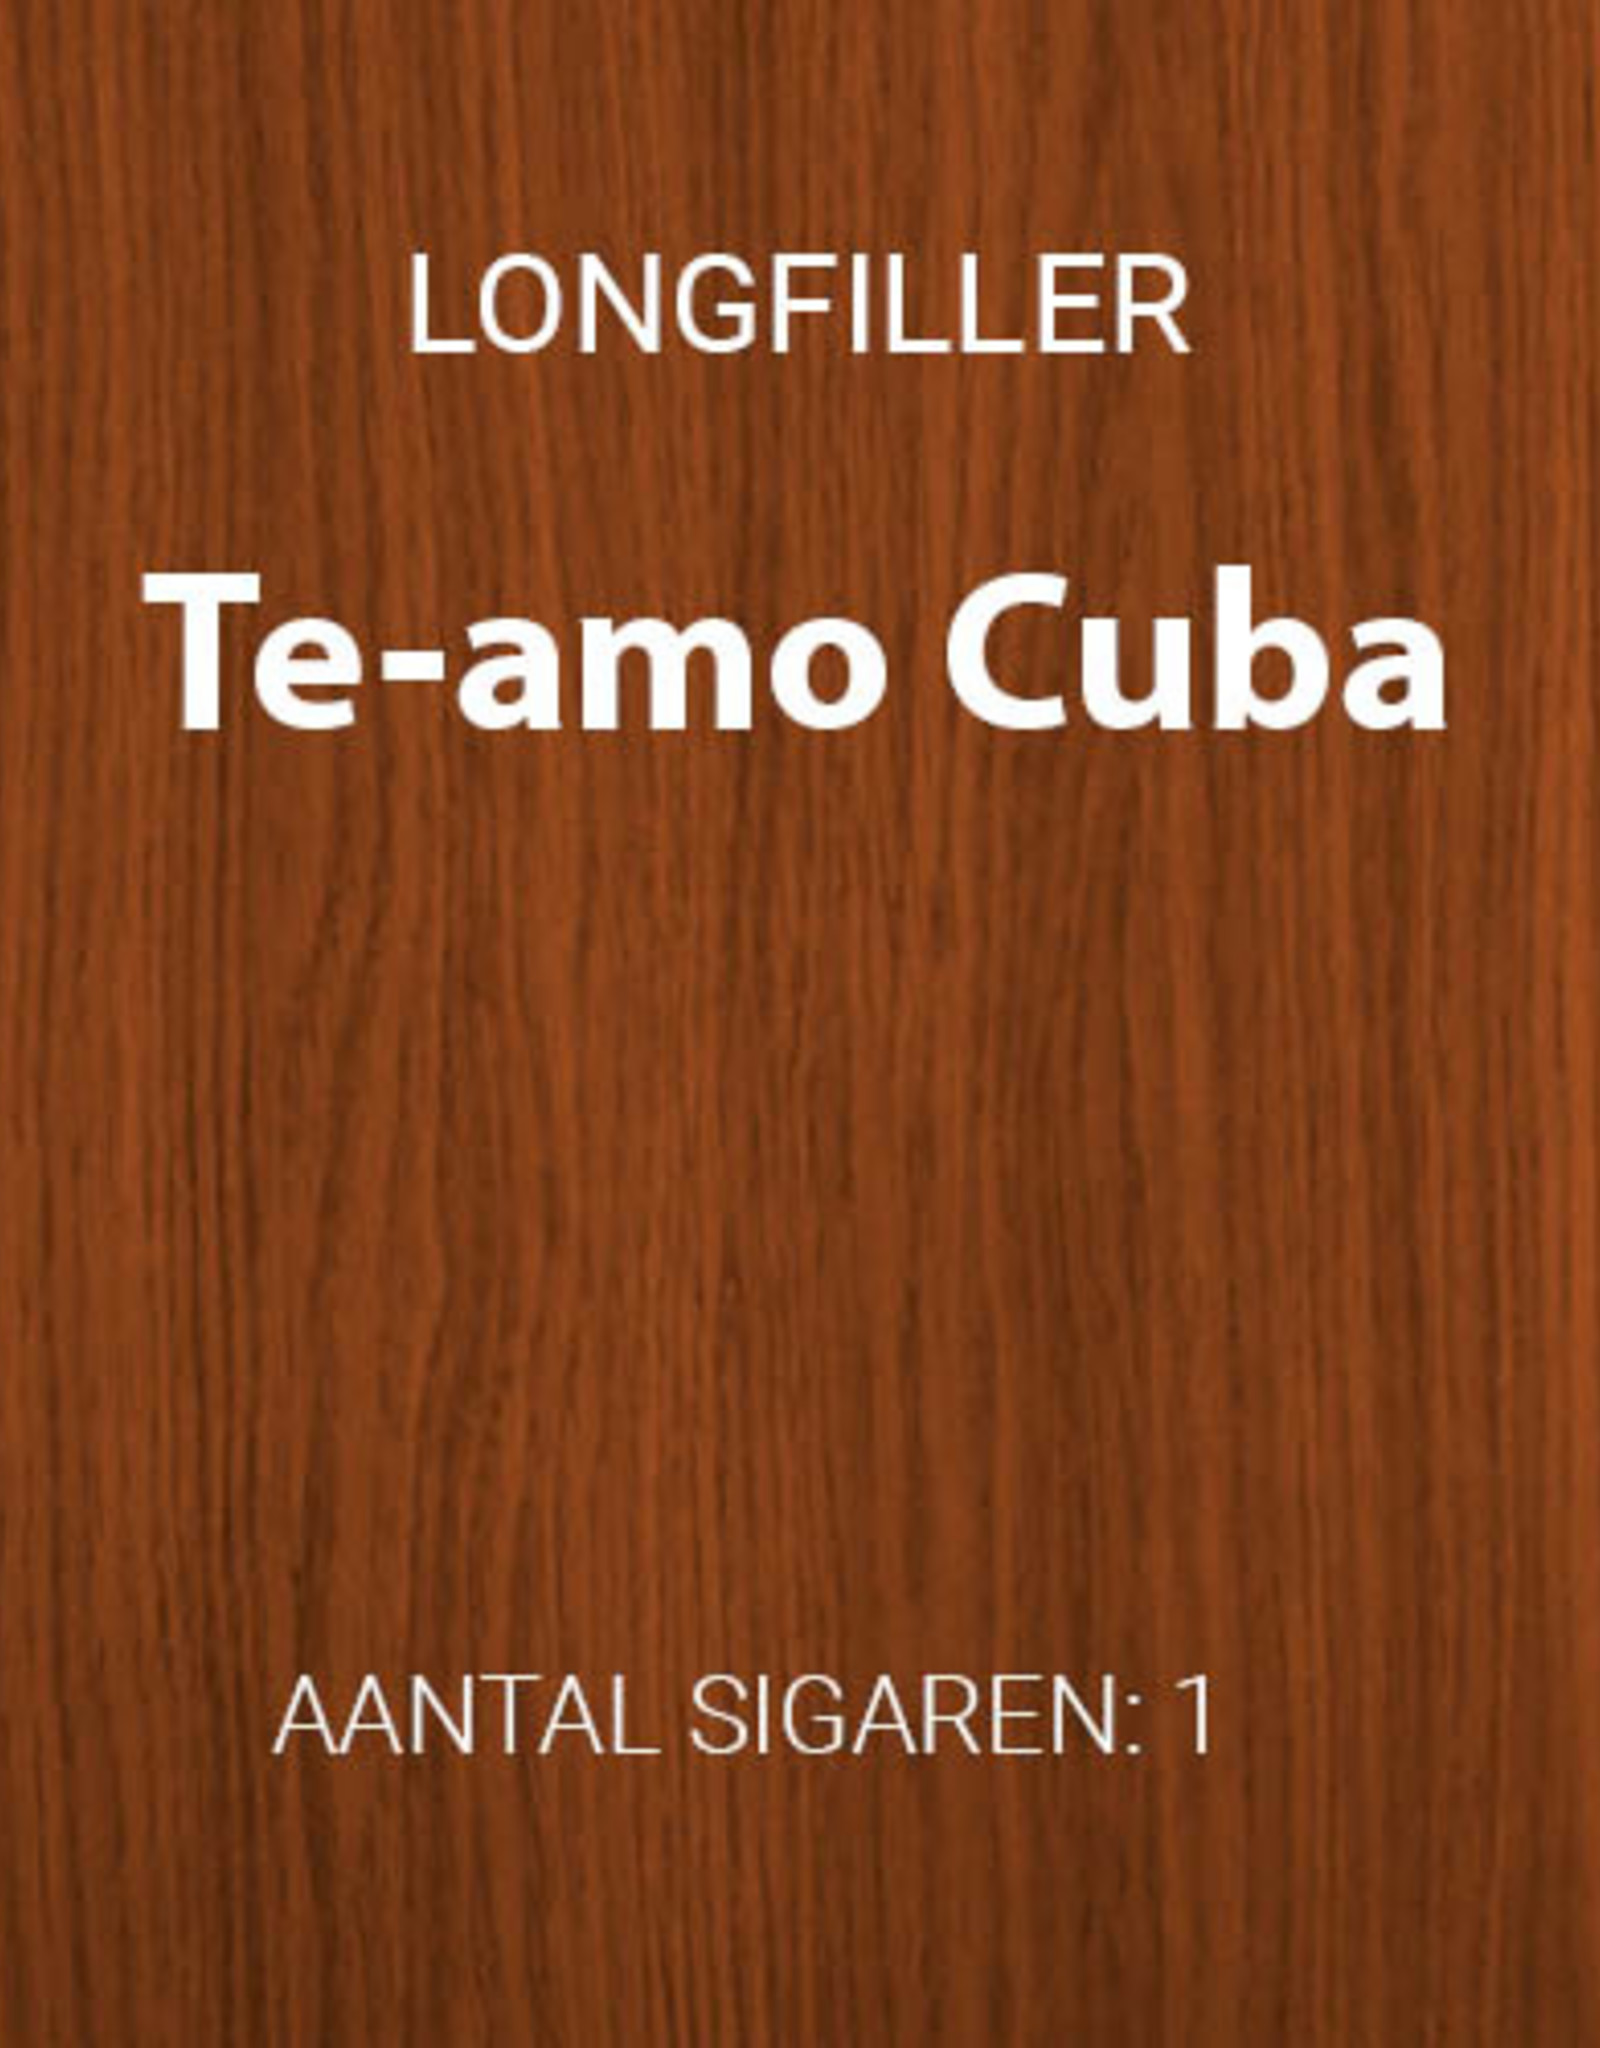 Te-Amo Cuba longfiller